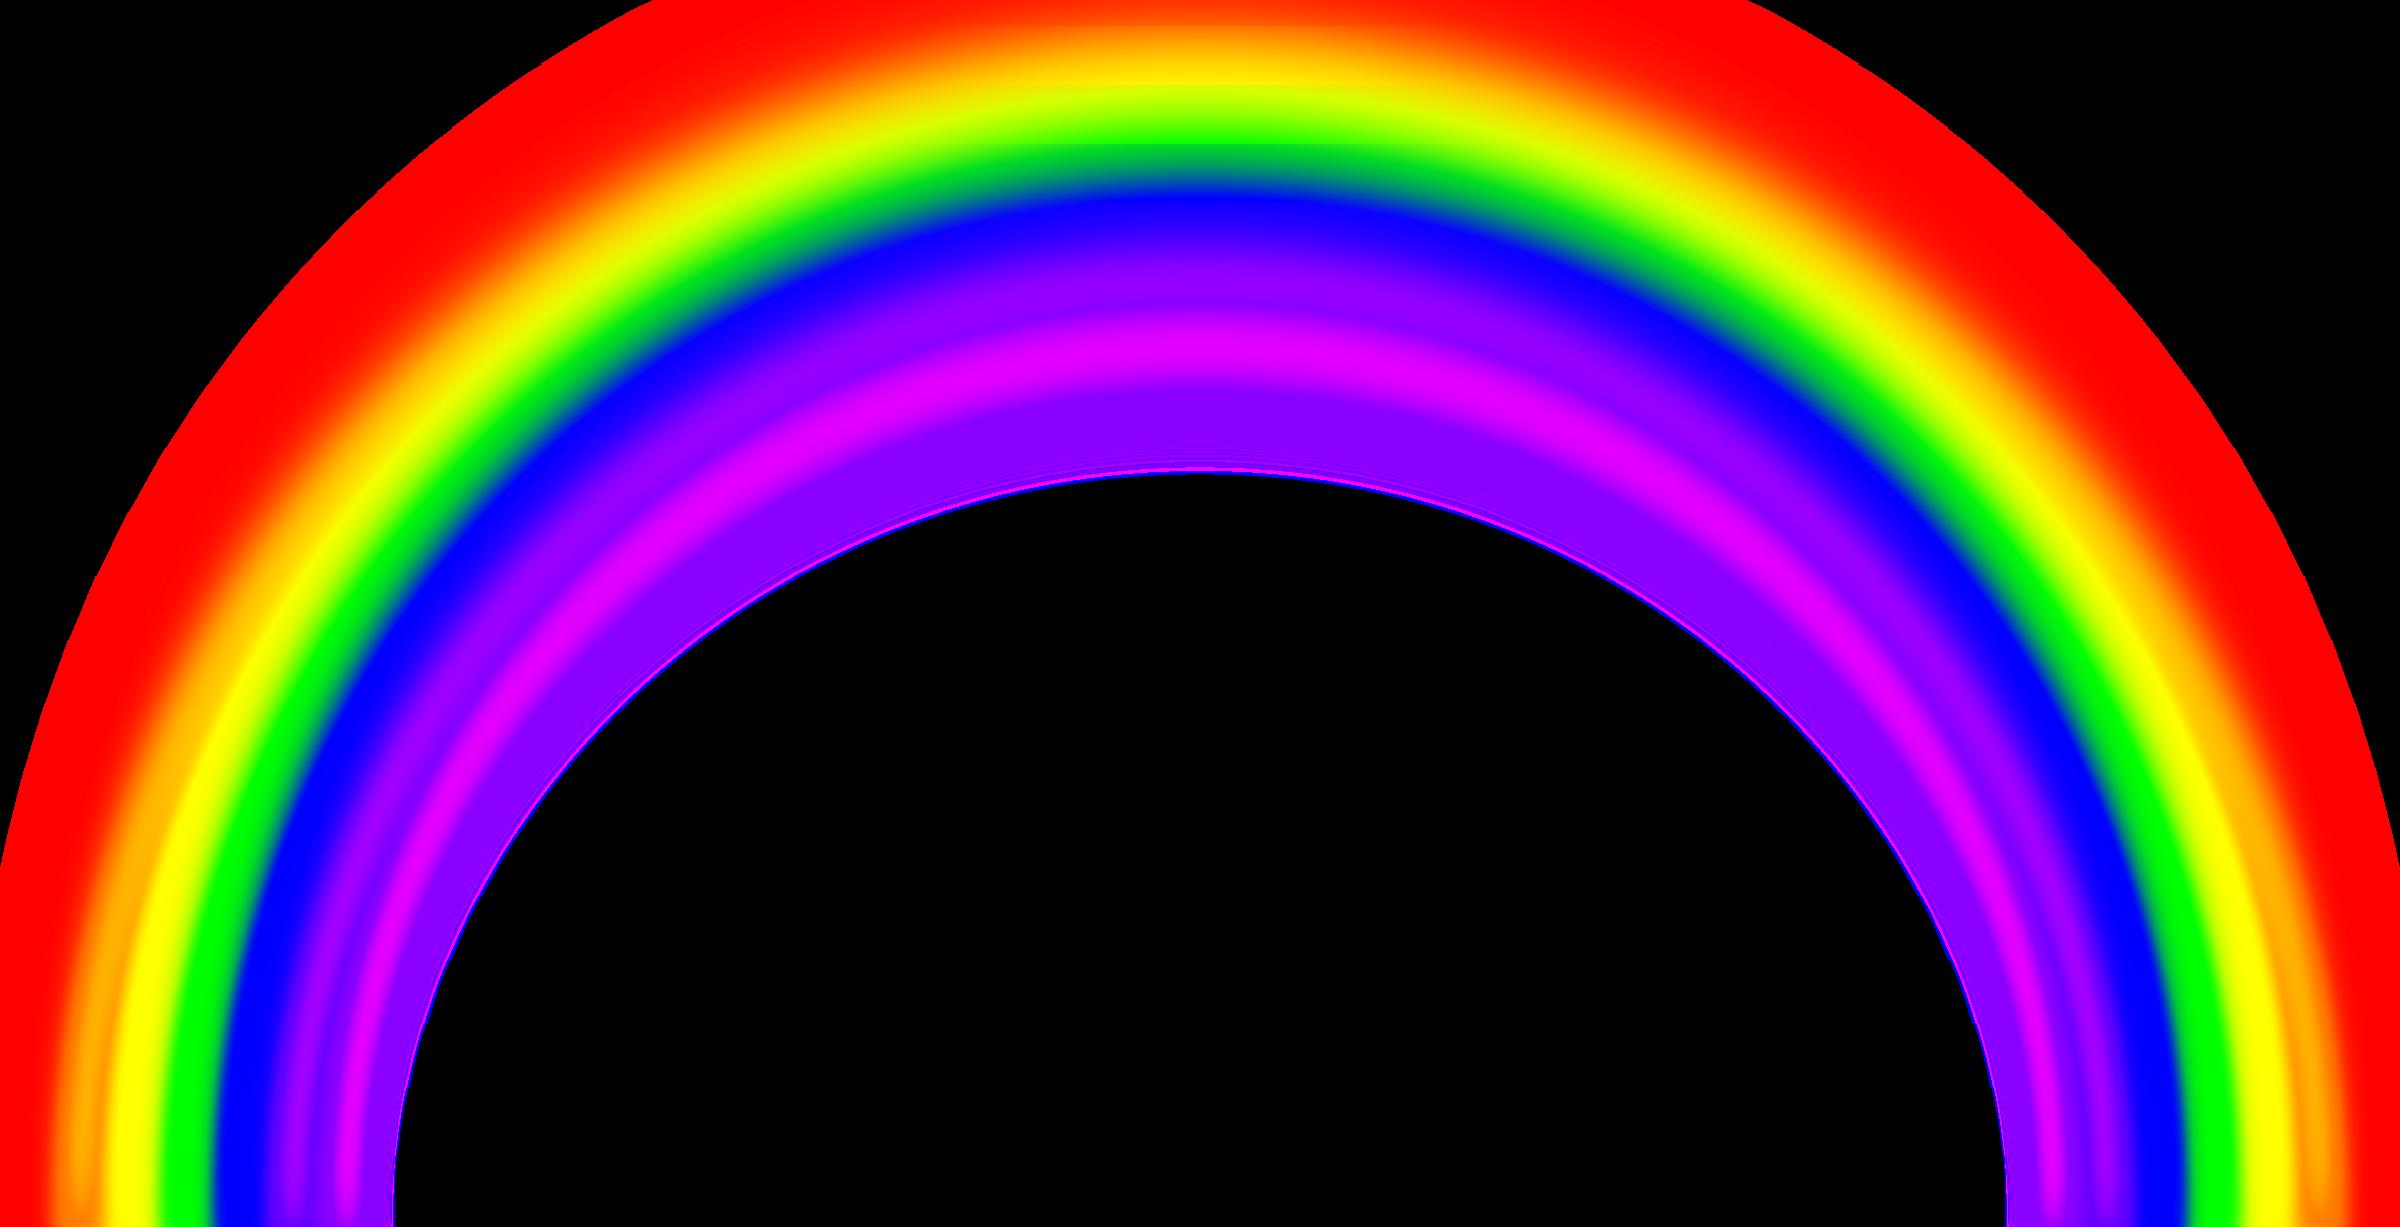 Blur clipart Simple with Rainbow Clipart Blur